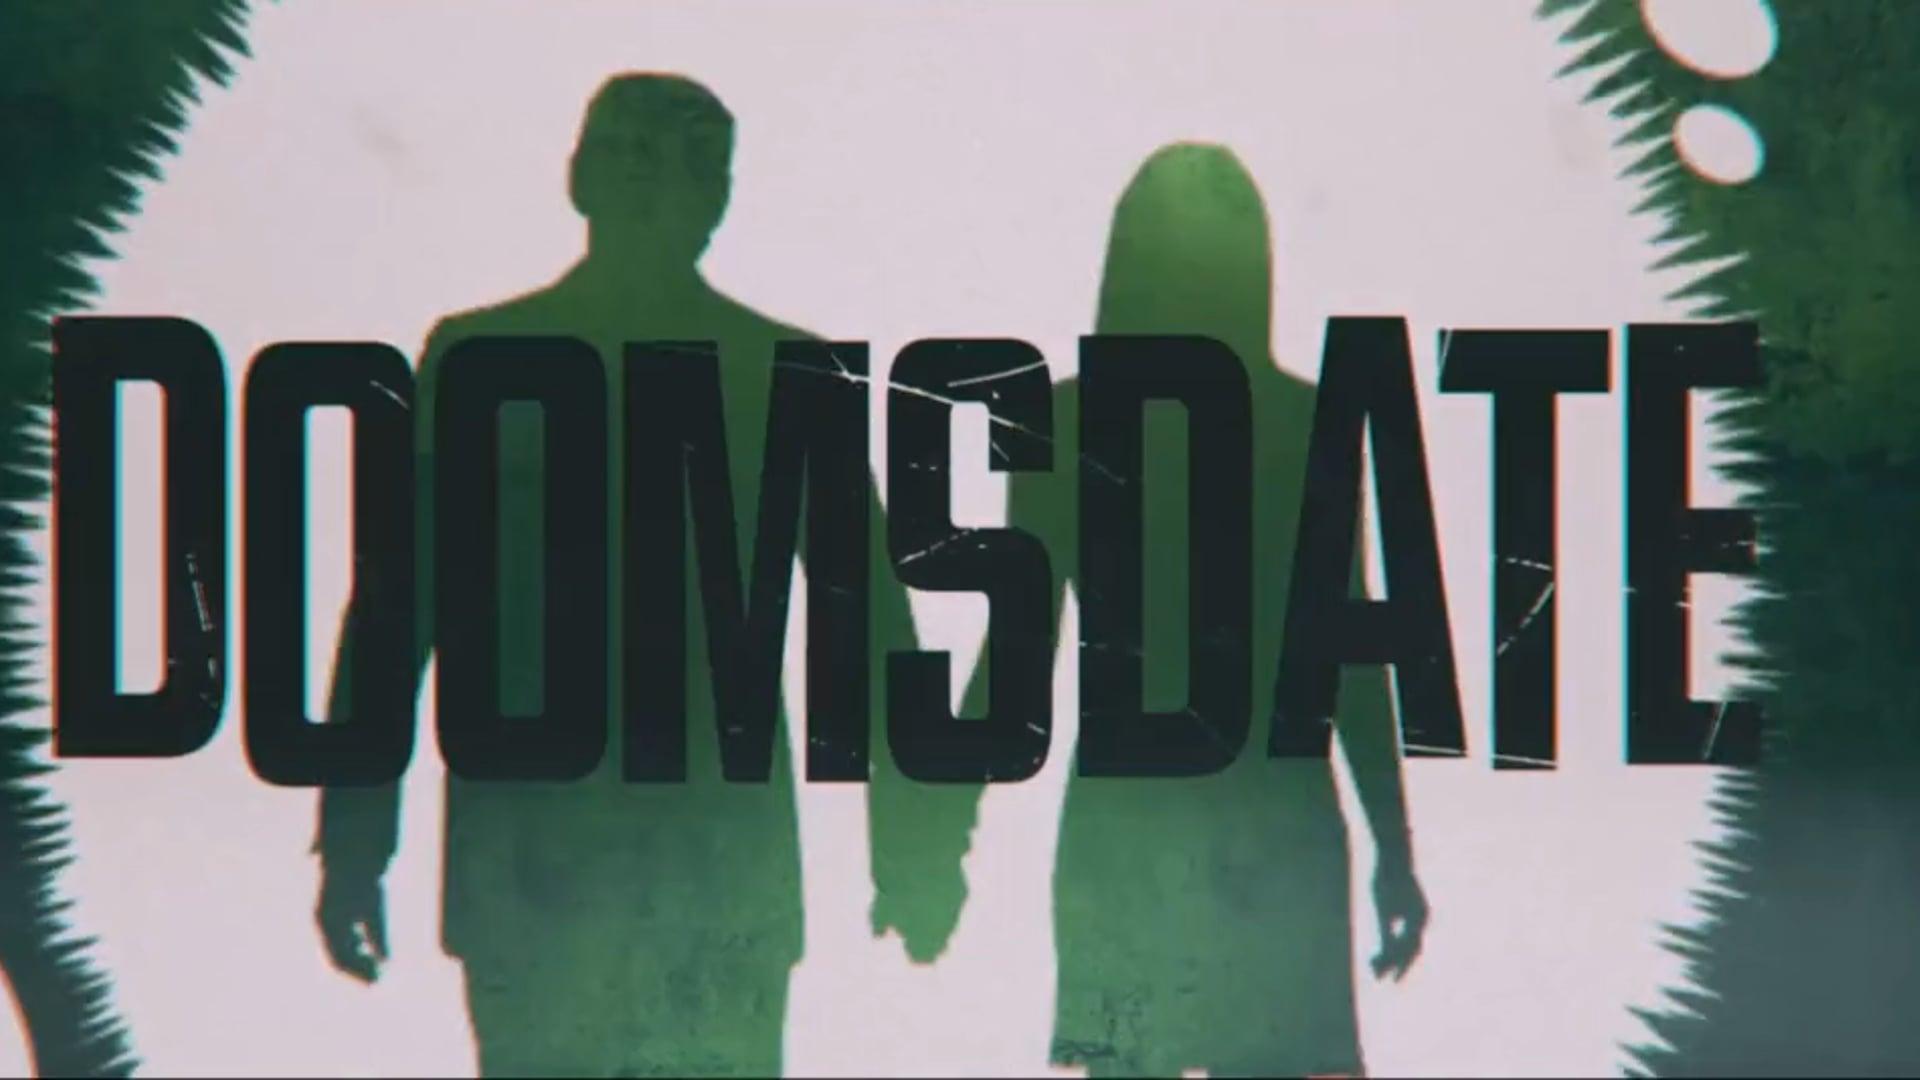 DoomsDate: The Series, Trailer